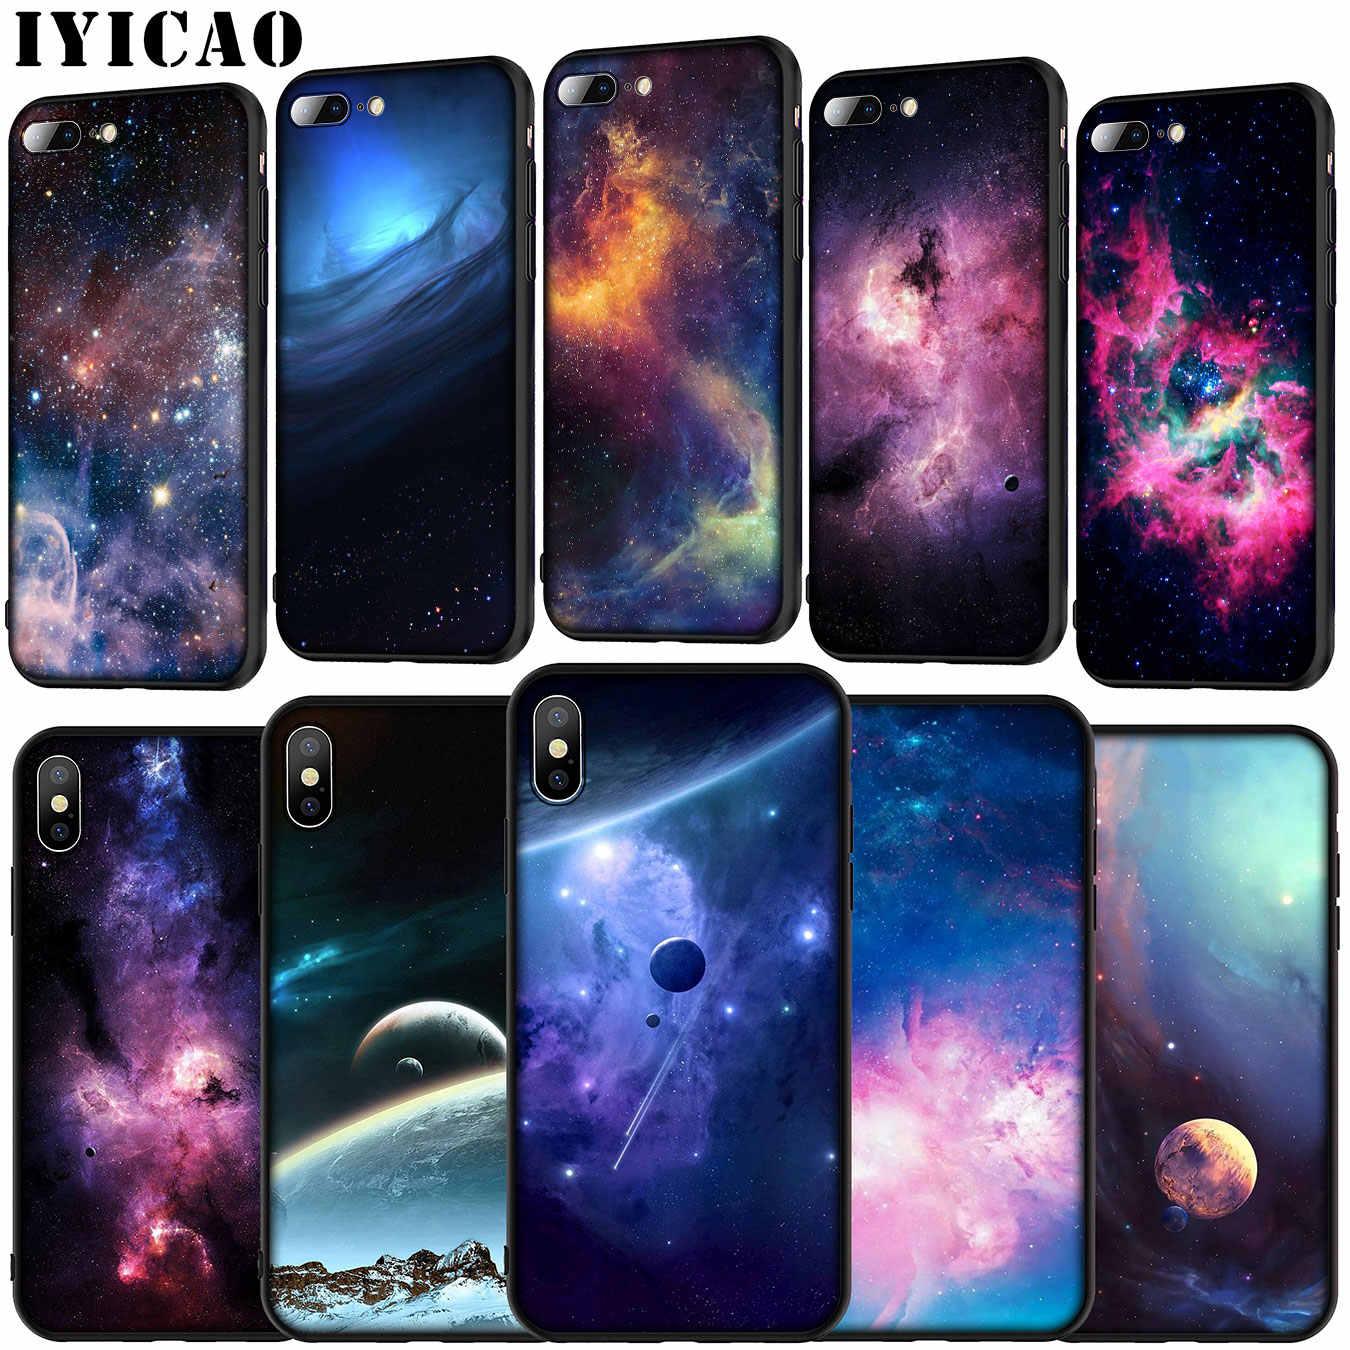 IYICAO الأرجواني الفضاء ستار لينة غطاء سيليكون حقيبة لهاتف أي فون 11 برو XR X XS ماكس 6 6S 7 8 زائد 5 5S SE الأسود TPU جراب هاتف